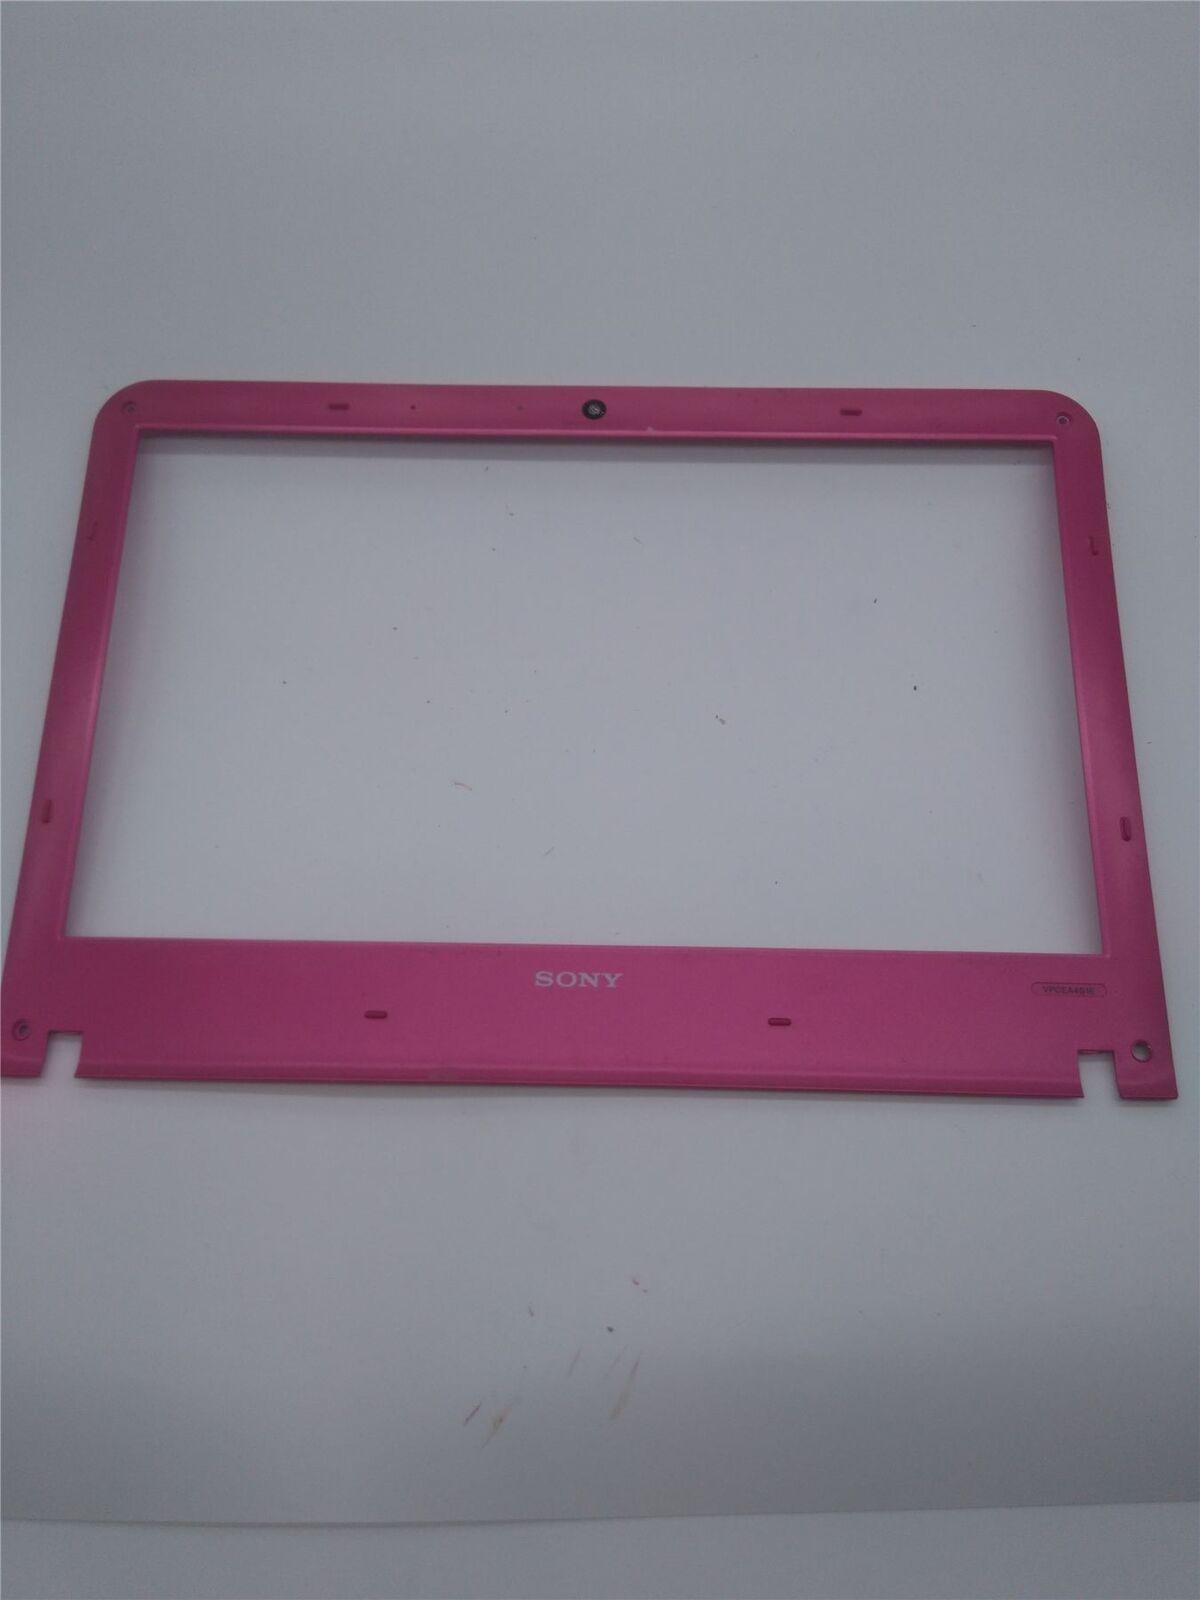 SONY VAIO PCG-61211M screen bezel, Used, Working